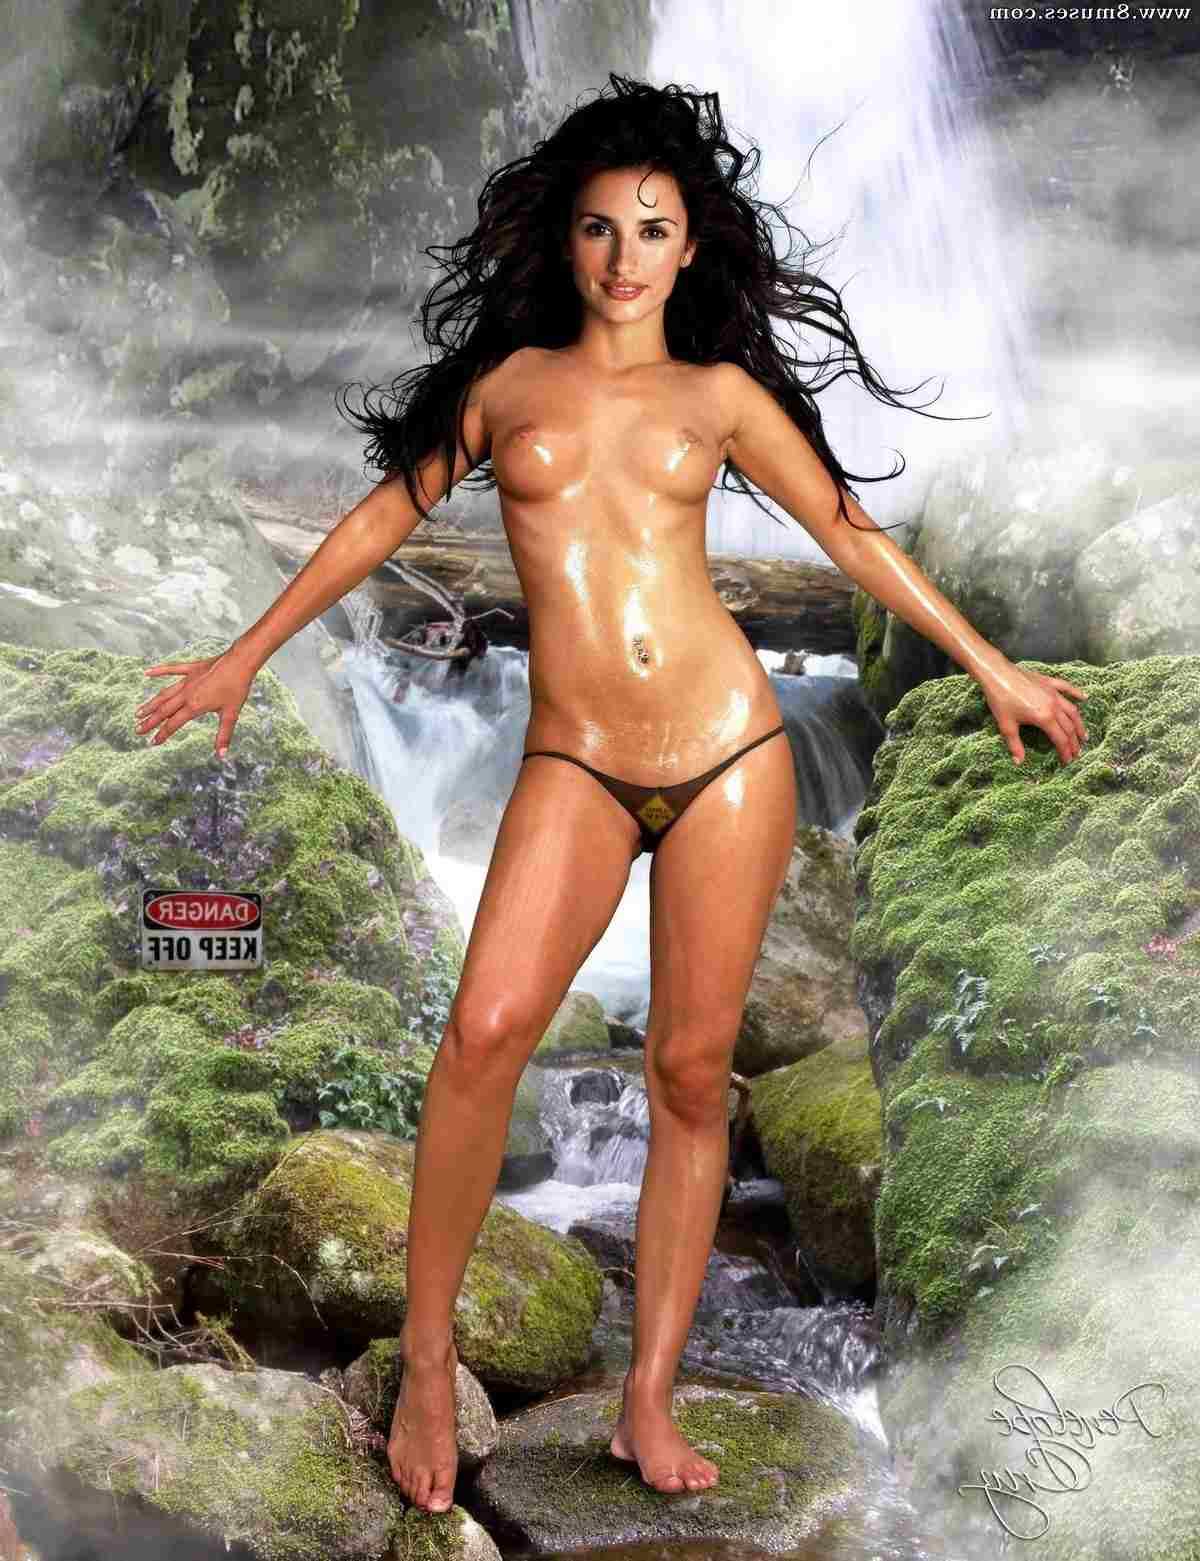 Fake-Celebrities-Sex-Pictures/Penelope-Cruz Penelope_Cruz__8muses_-_Sex_and_Porn_Comics_49.jpg